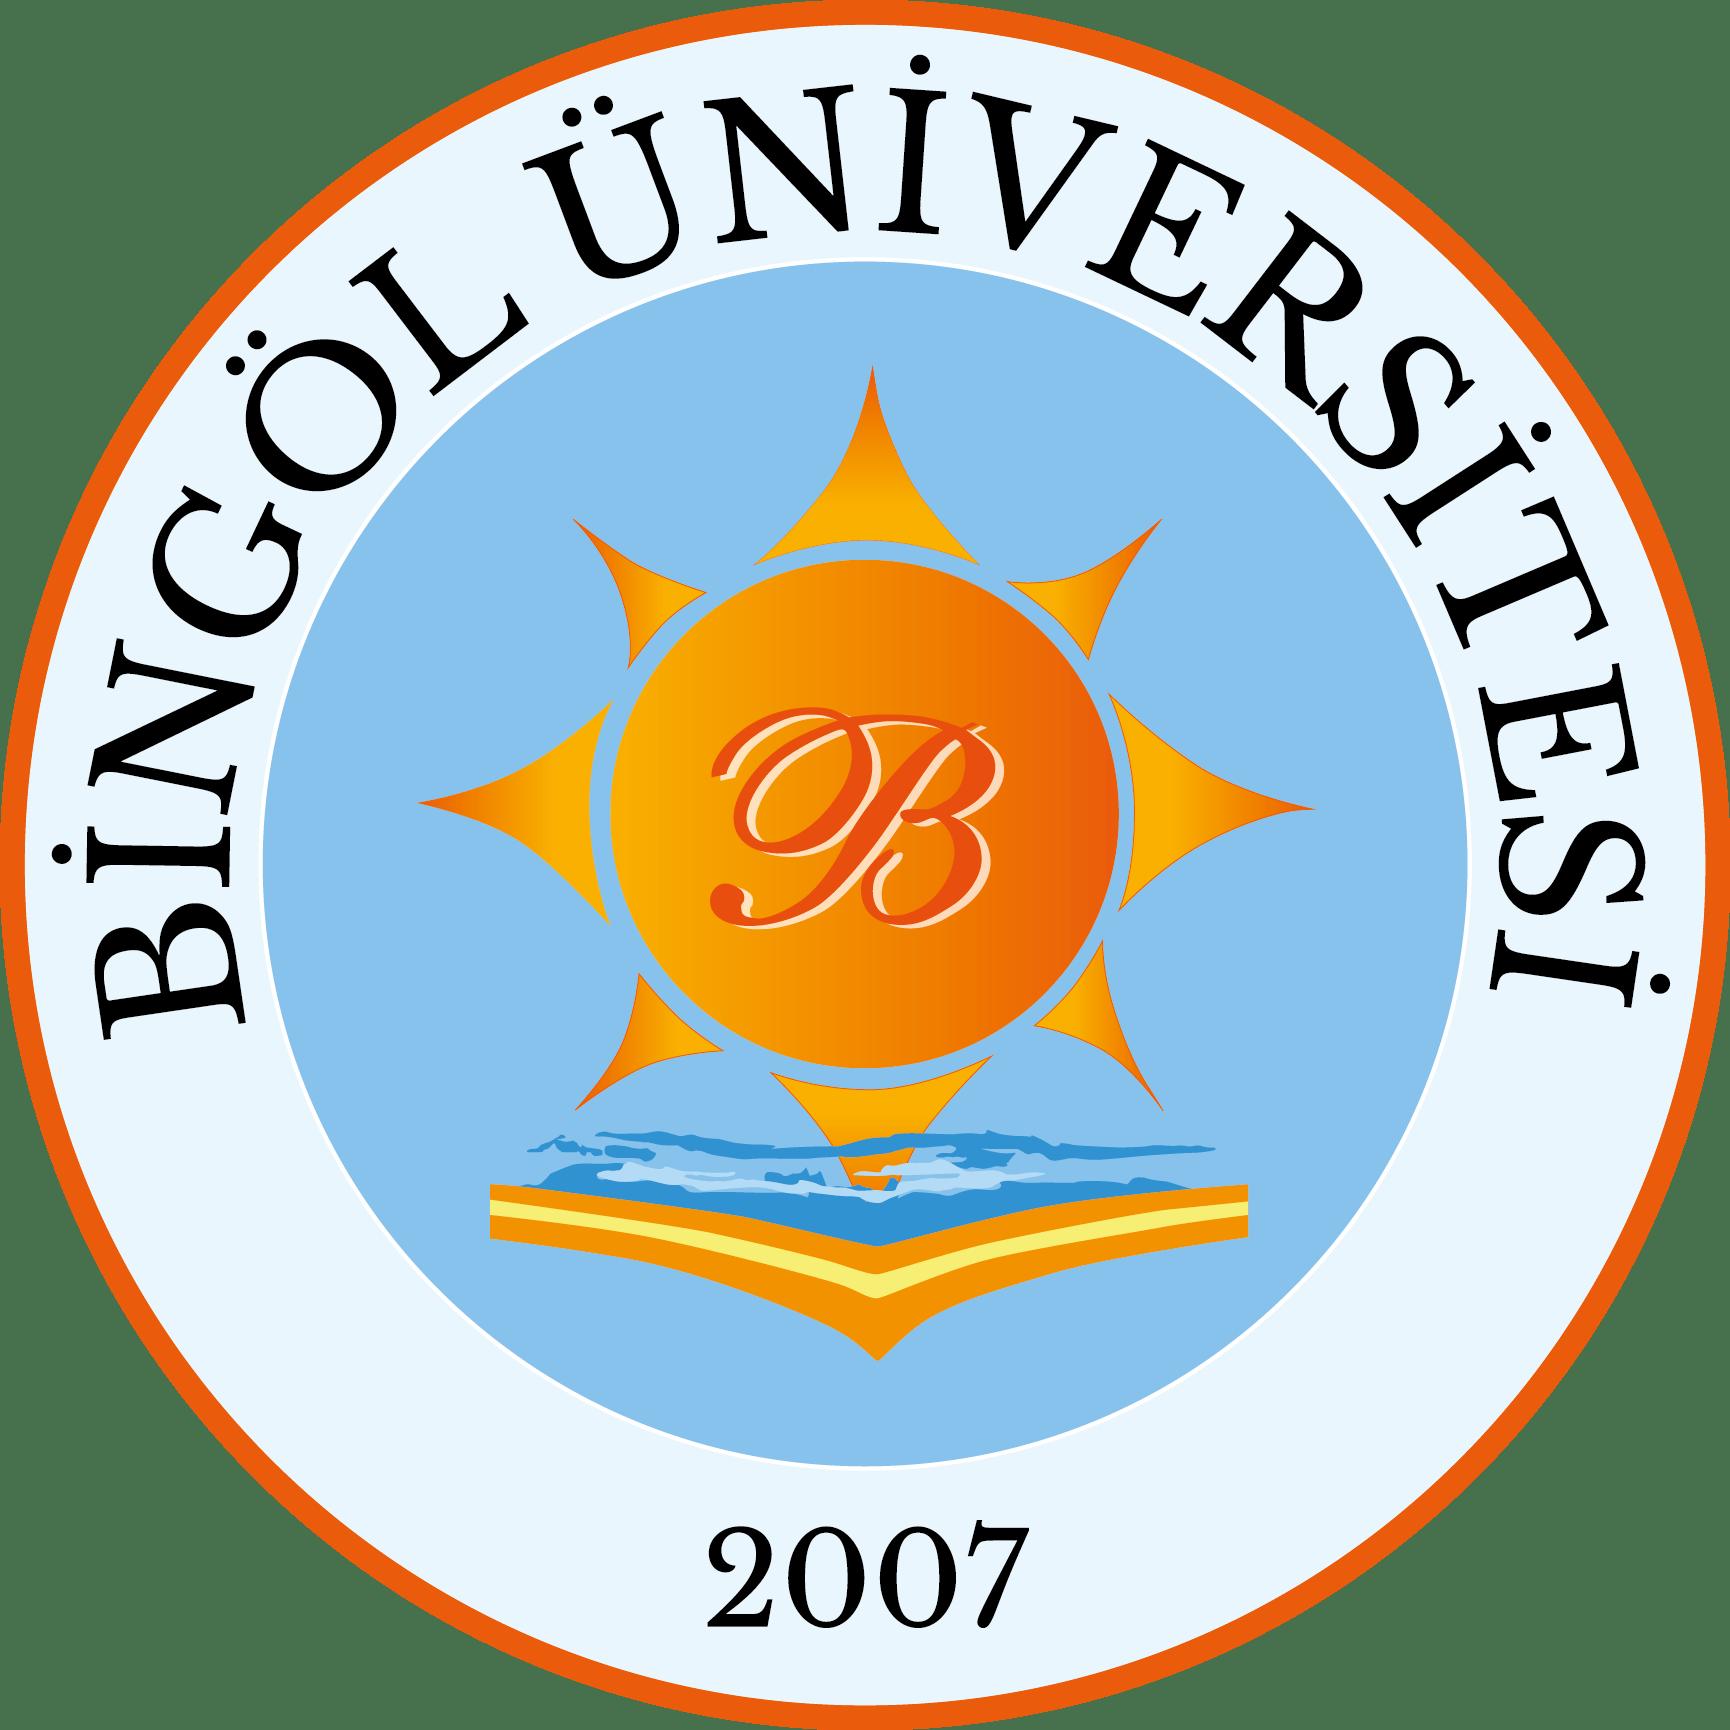 bingol